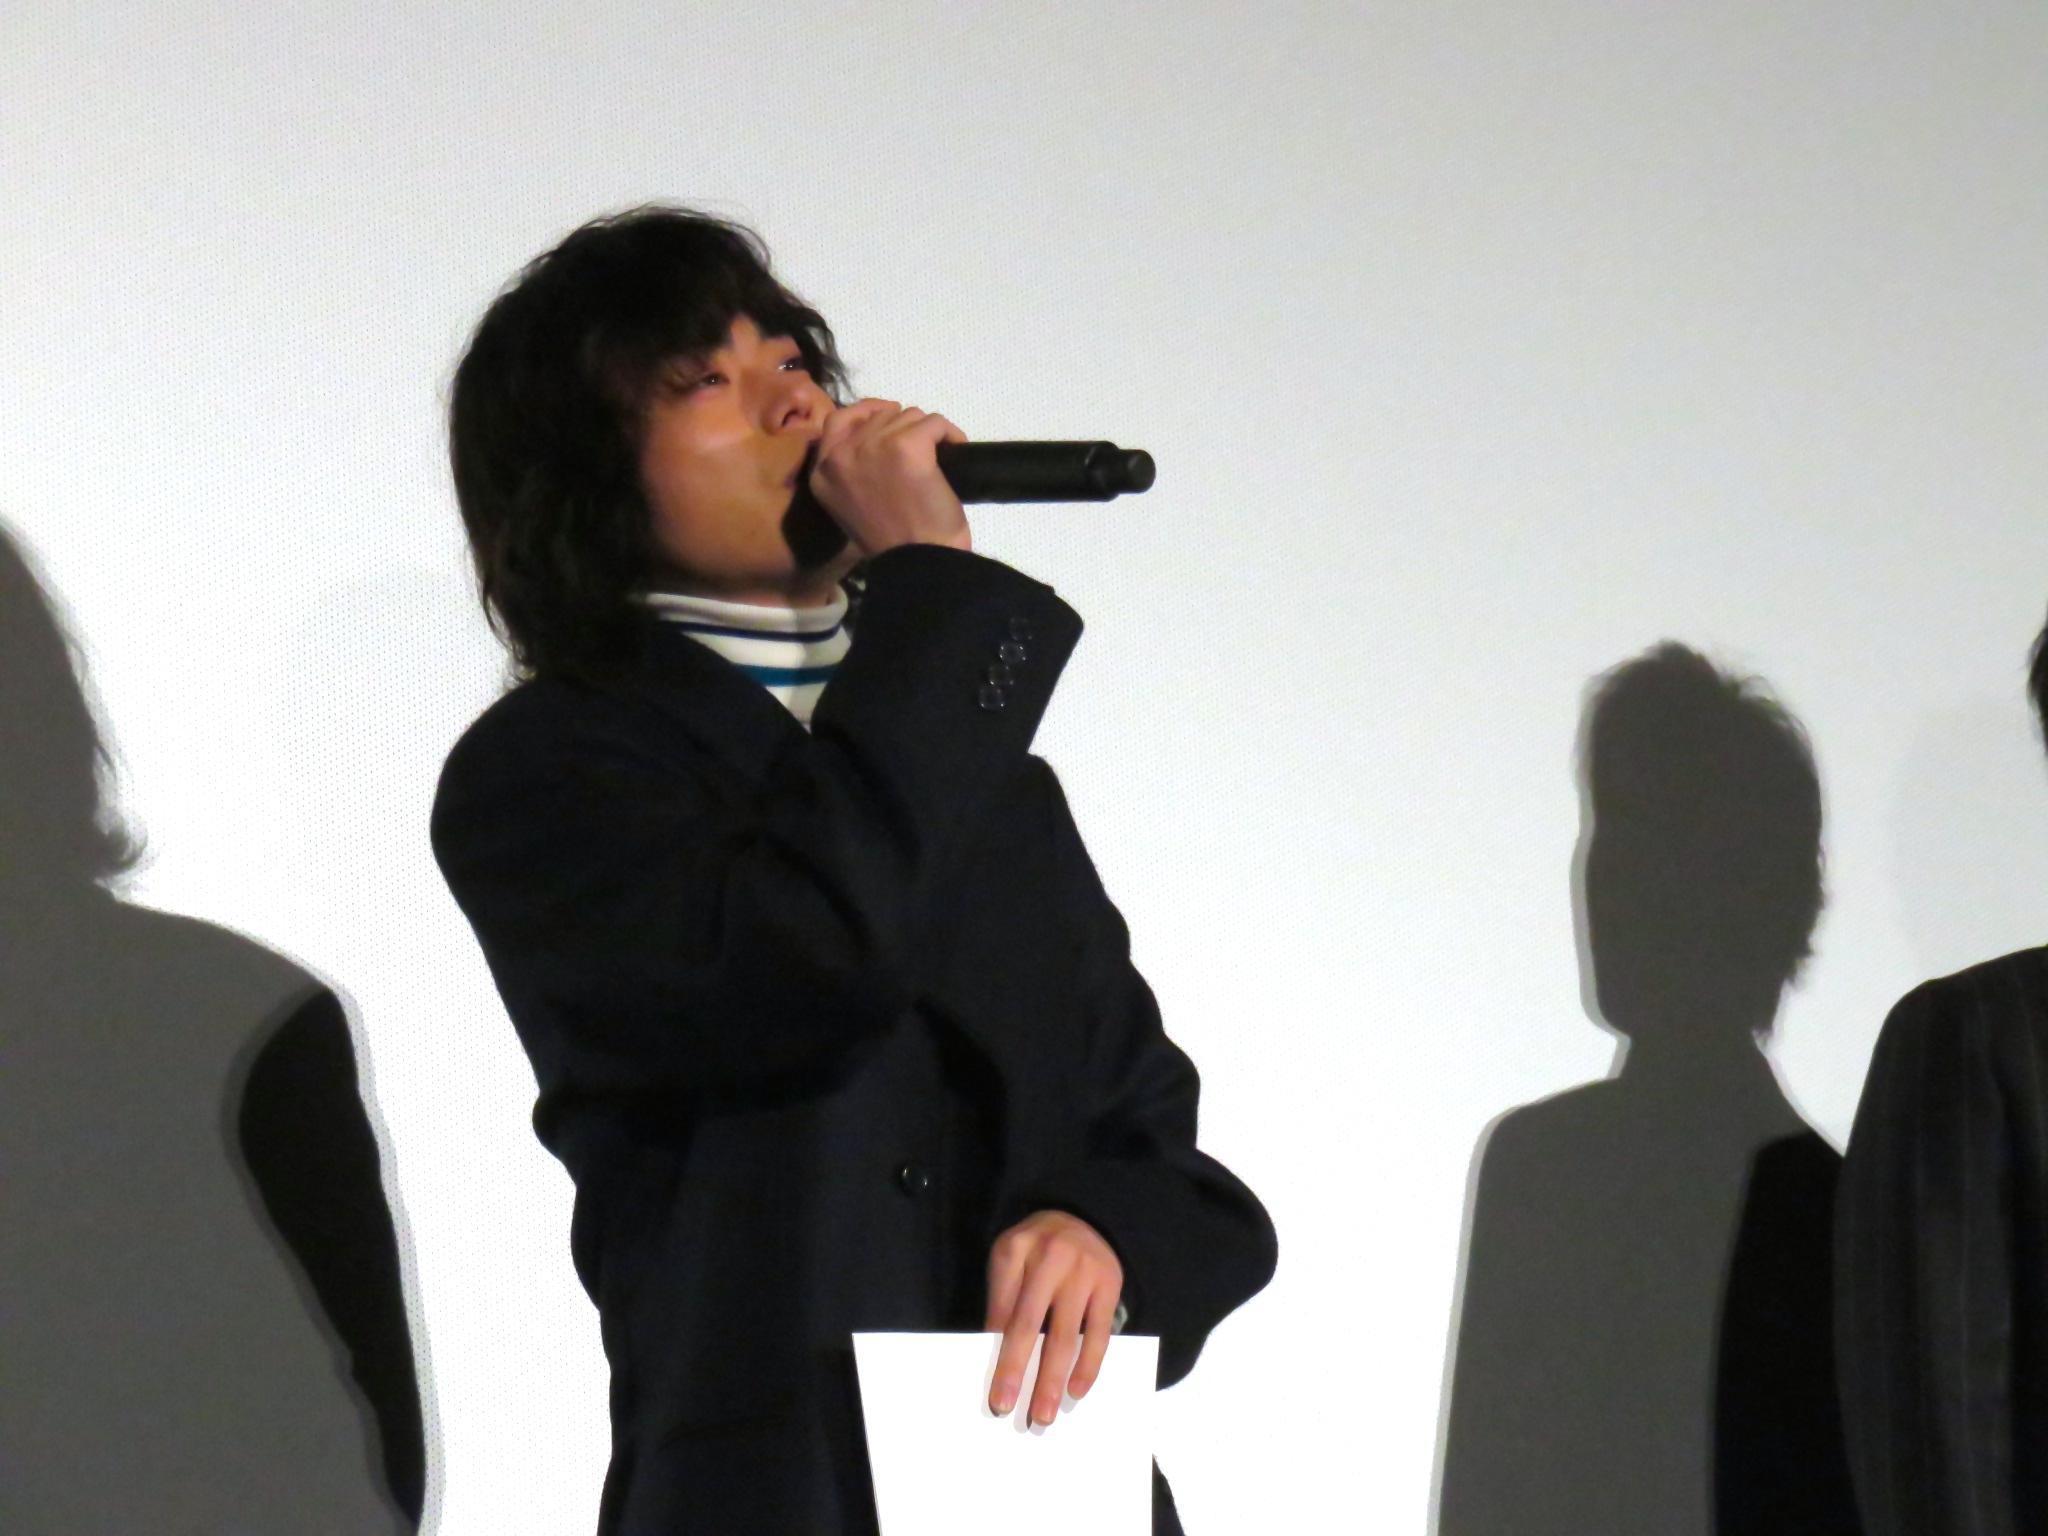 http://news.yoshimoto.co.jp/20171201003537-e7698c5d3efa405b294df4c879cc286bd38c362d.jpg